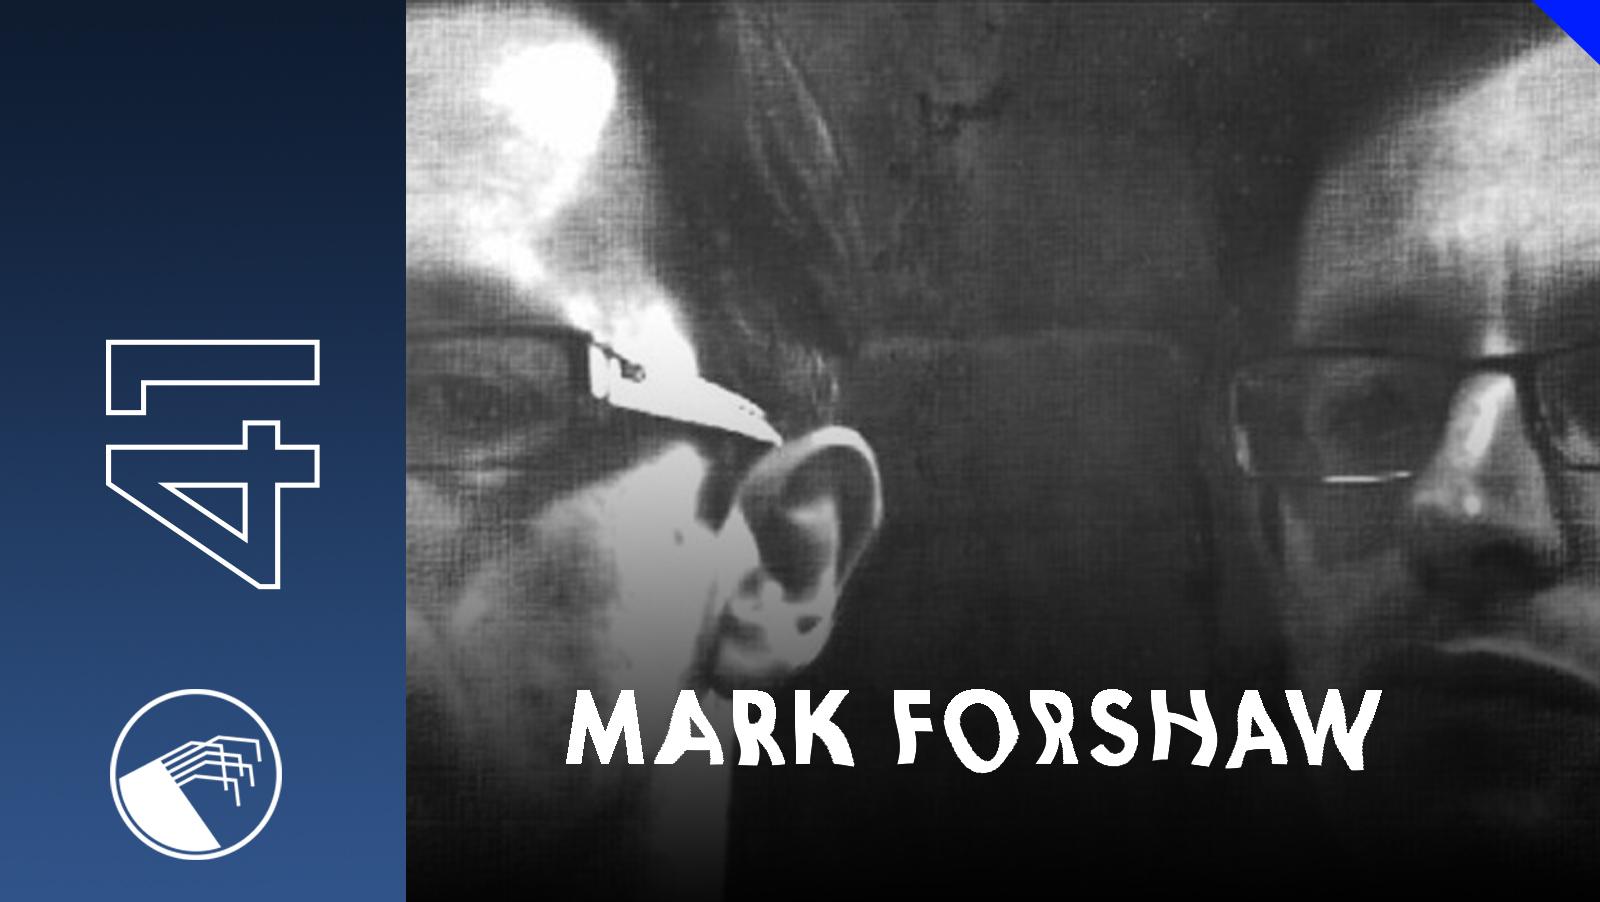 041 Mark Forshaw